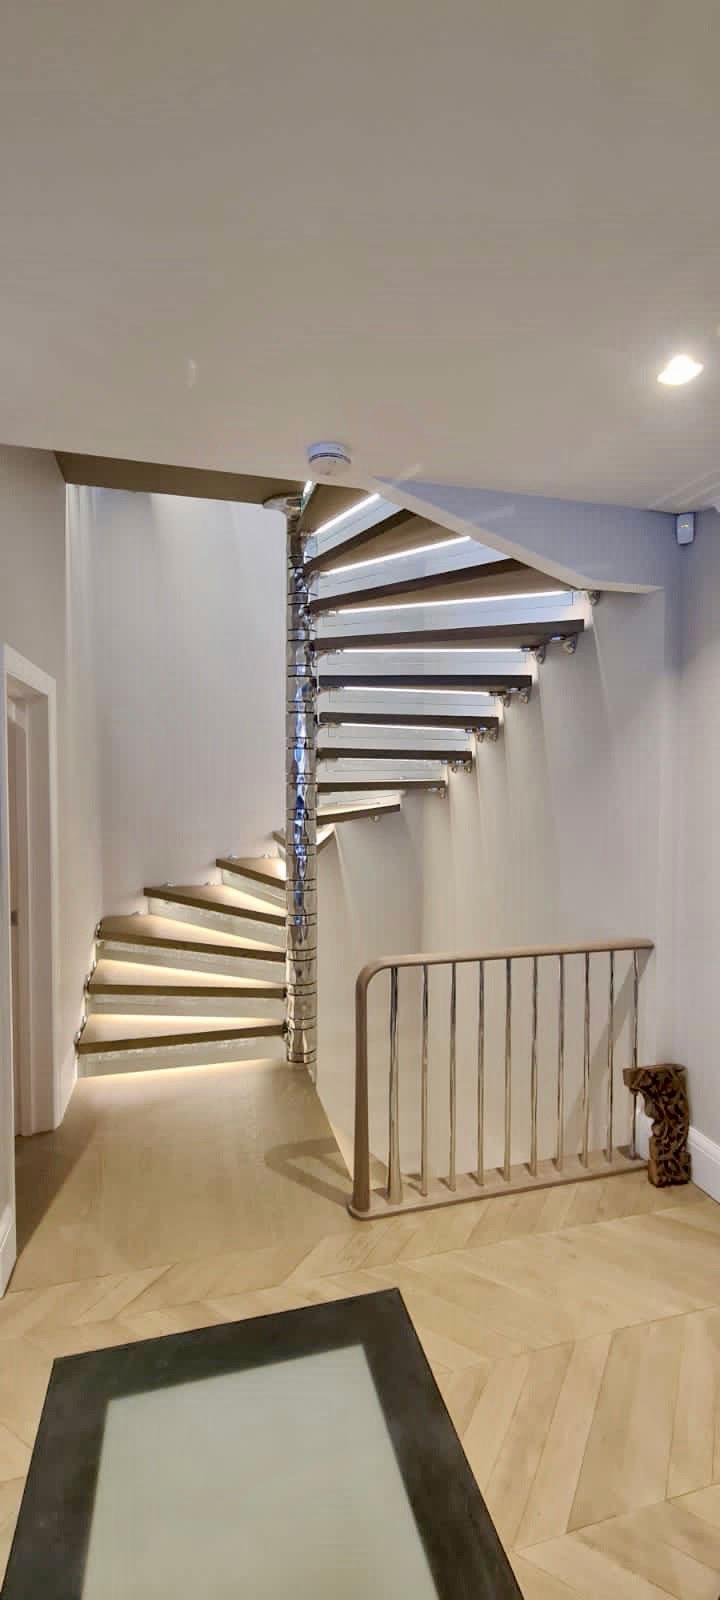 laverton1 Laverton Staircase